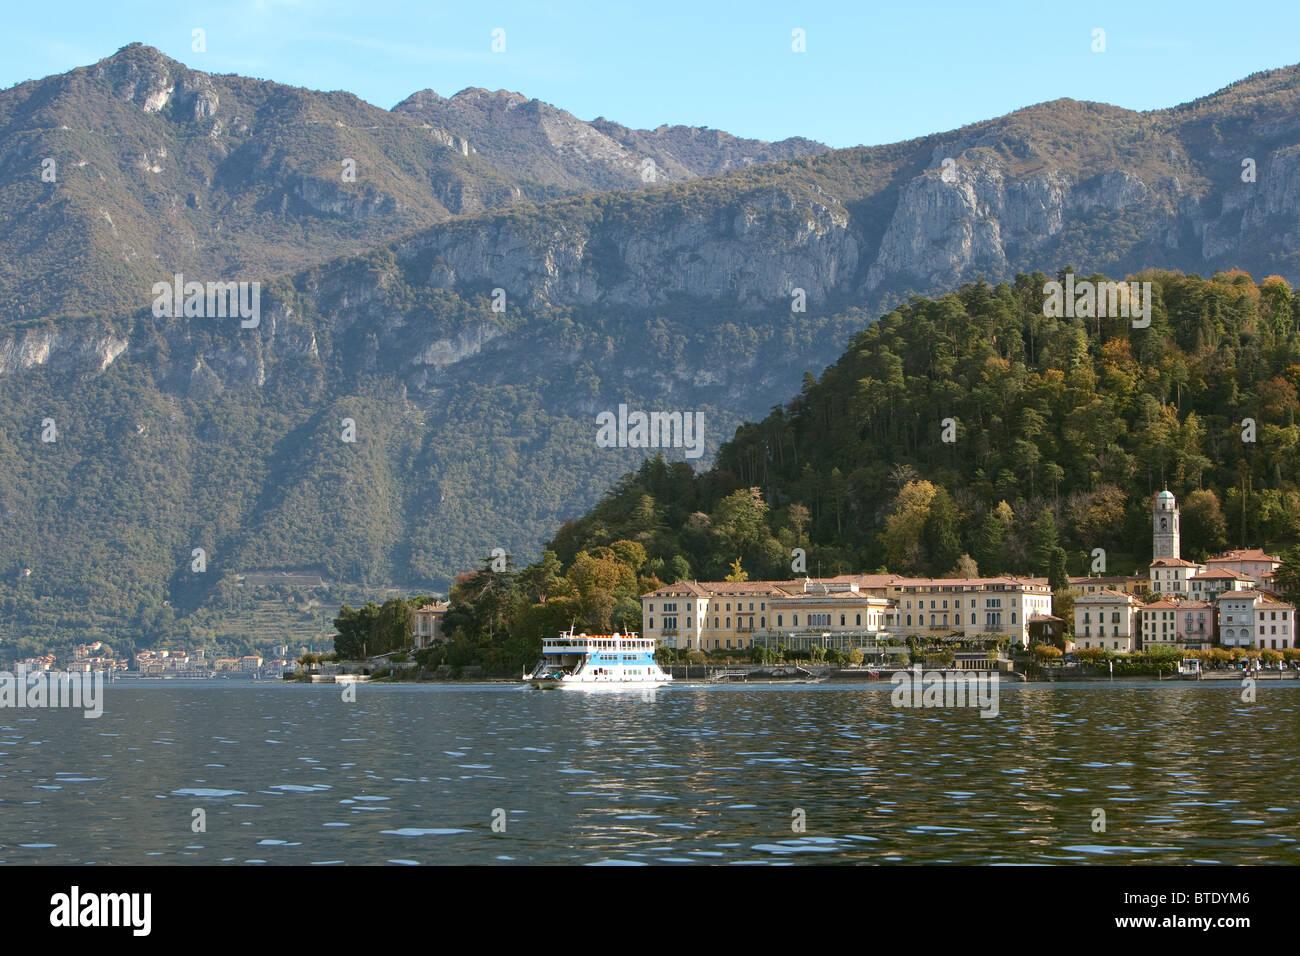 Car Ferry Leaving Bellagio Lake Como Italy Stock Photo Royalty